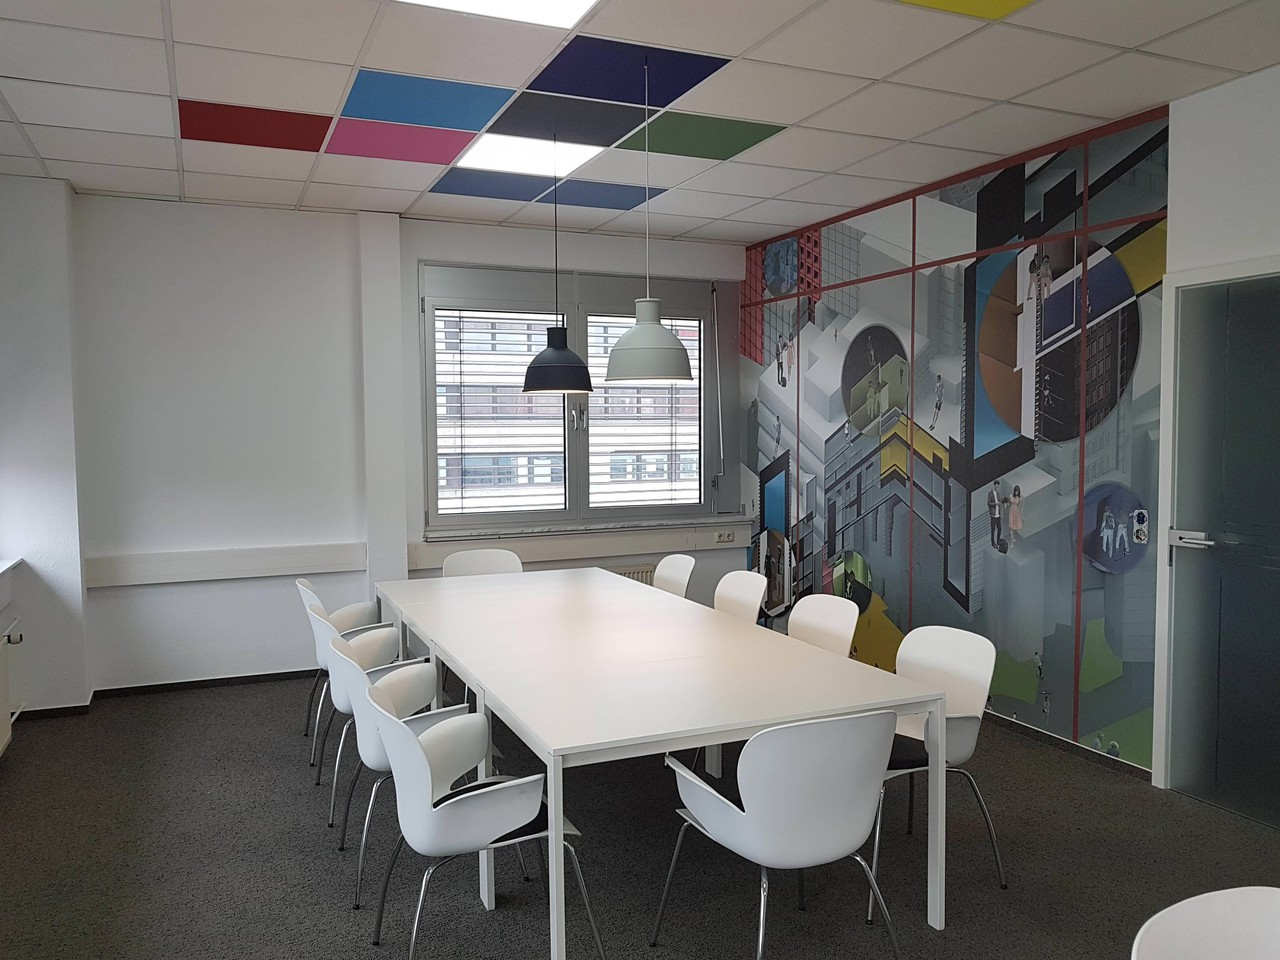 Frankfurt am Main training rooms Meetingraum Meetingraum image 1